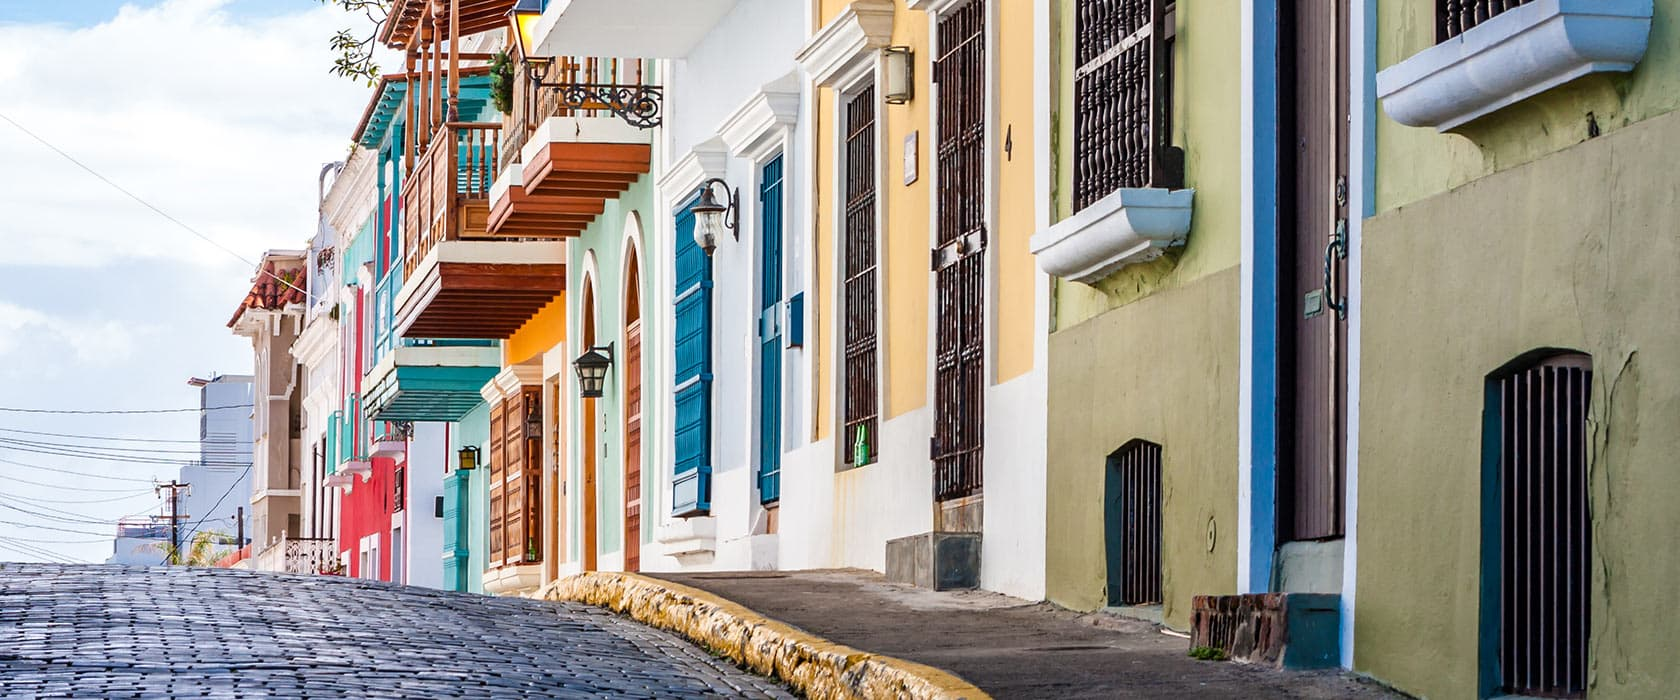 Caribe Hilton Attractions Activities San Juan Puerto Rico